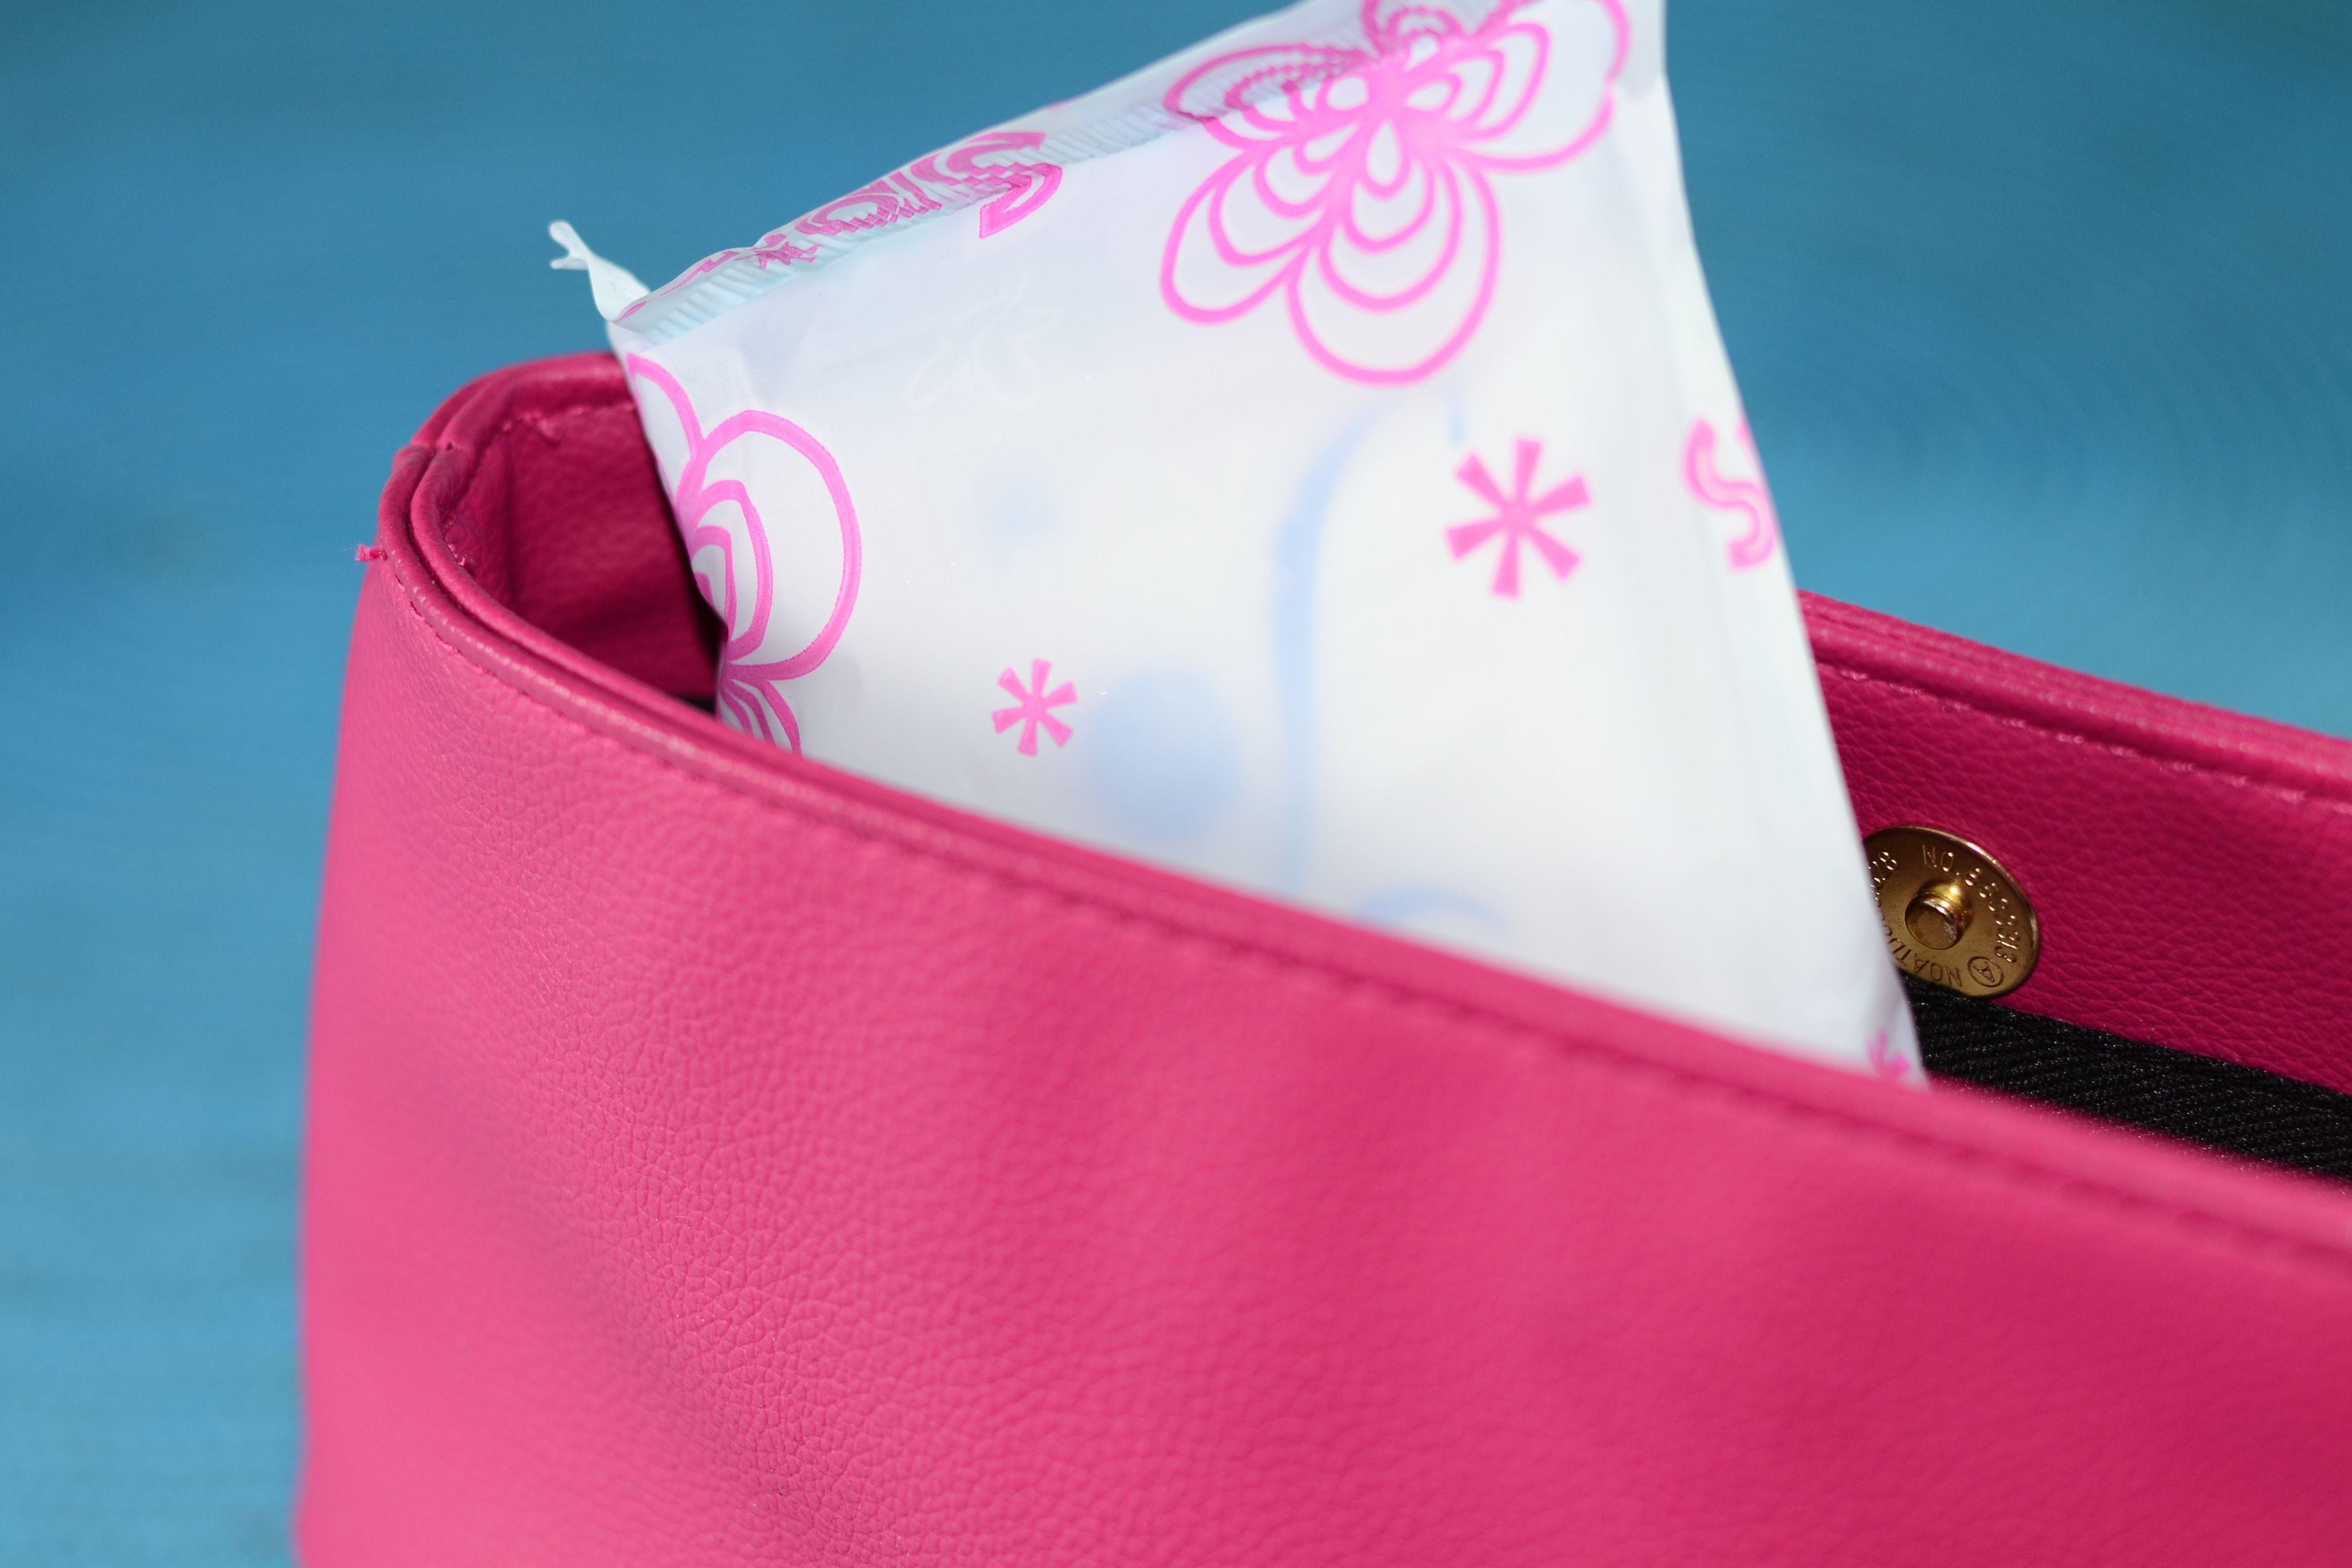 Make an Emergency Period and Makeup Kit Period kit